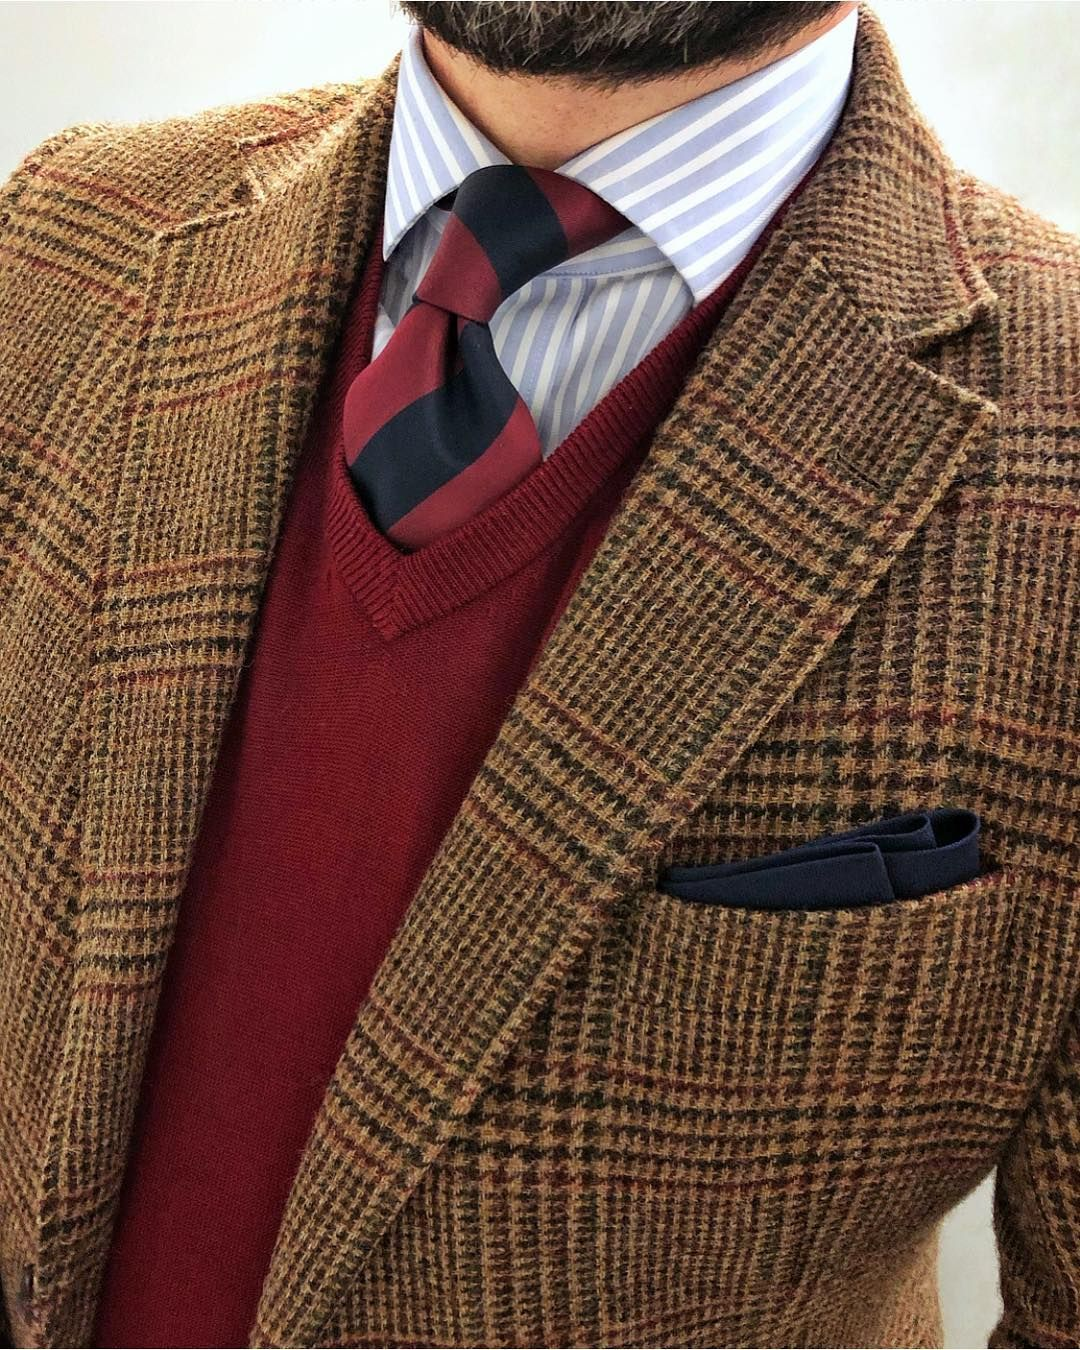 Tweed jacket, maroon sweater, striped tie | Mens outfits